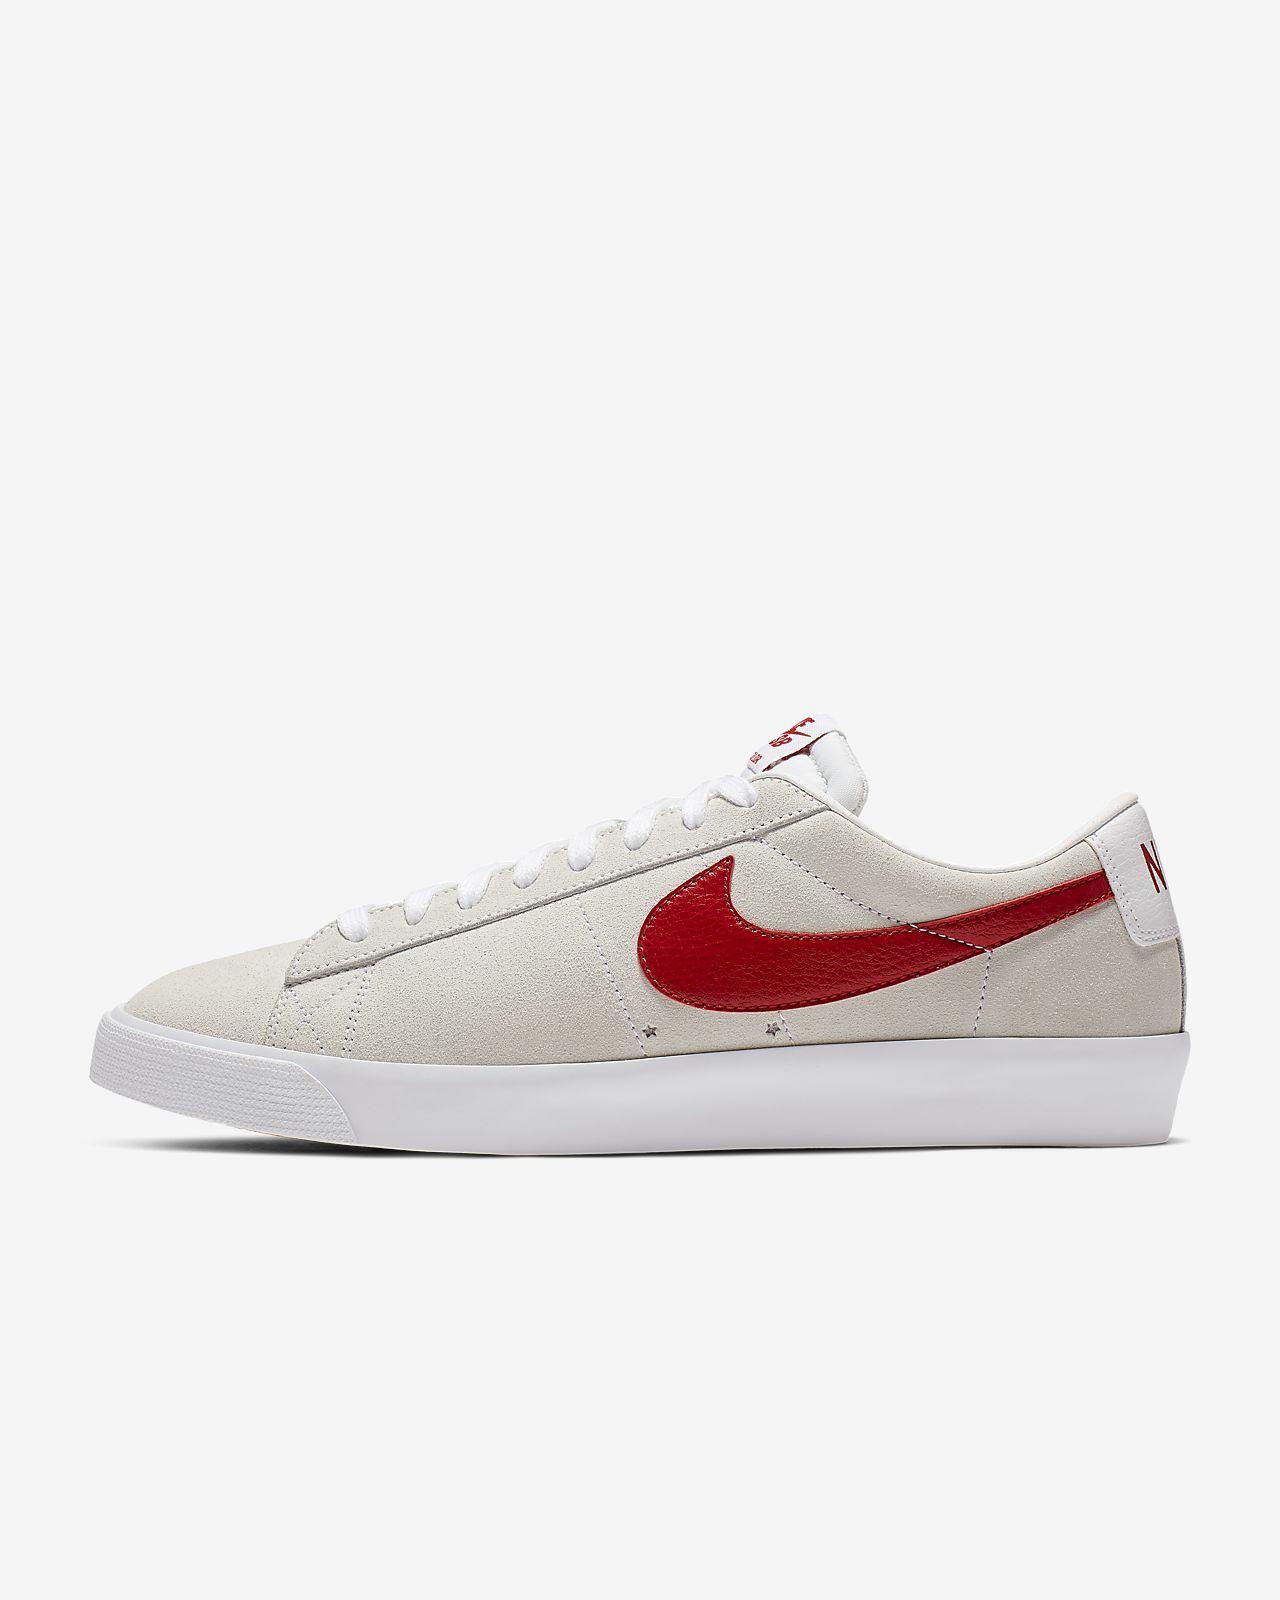 online retailer 497d3 6bff3 ... Chaussure de skateboard Nike SB Blazer Low GT